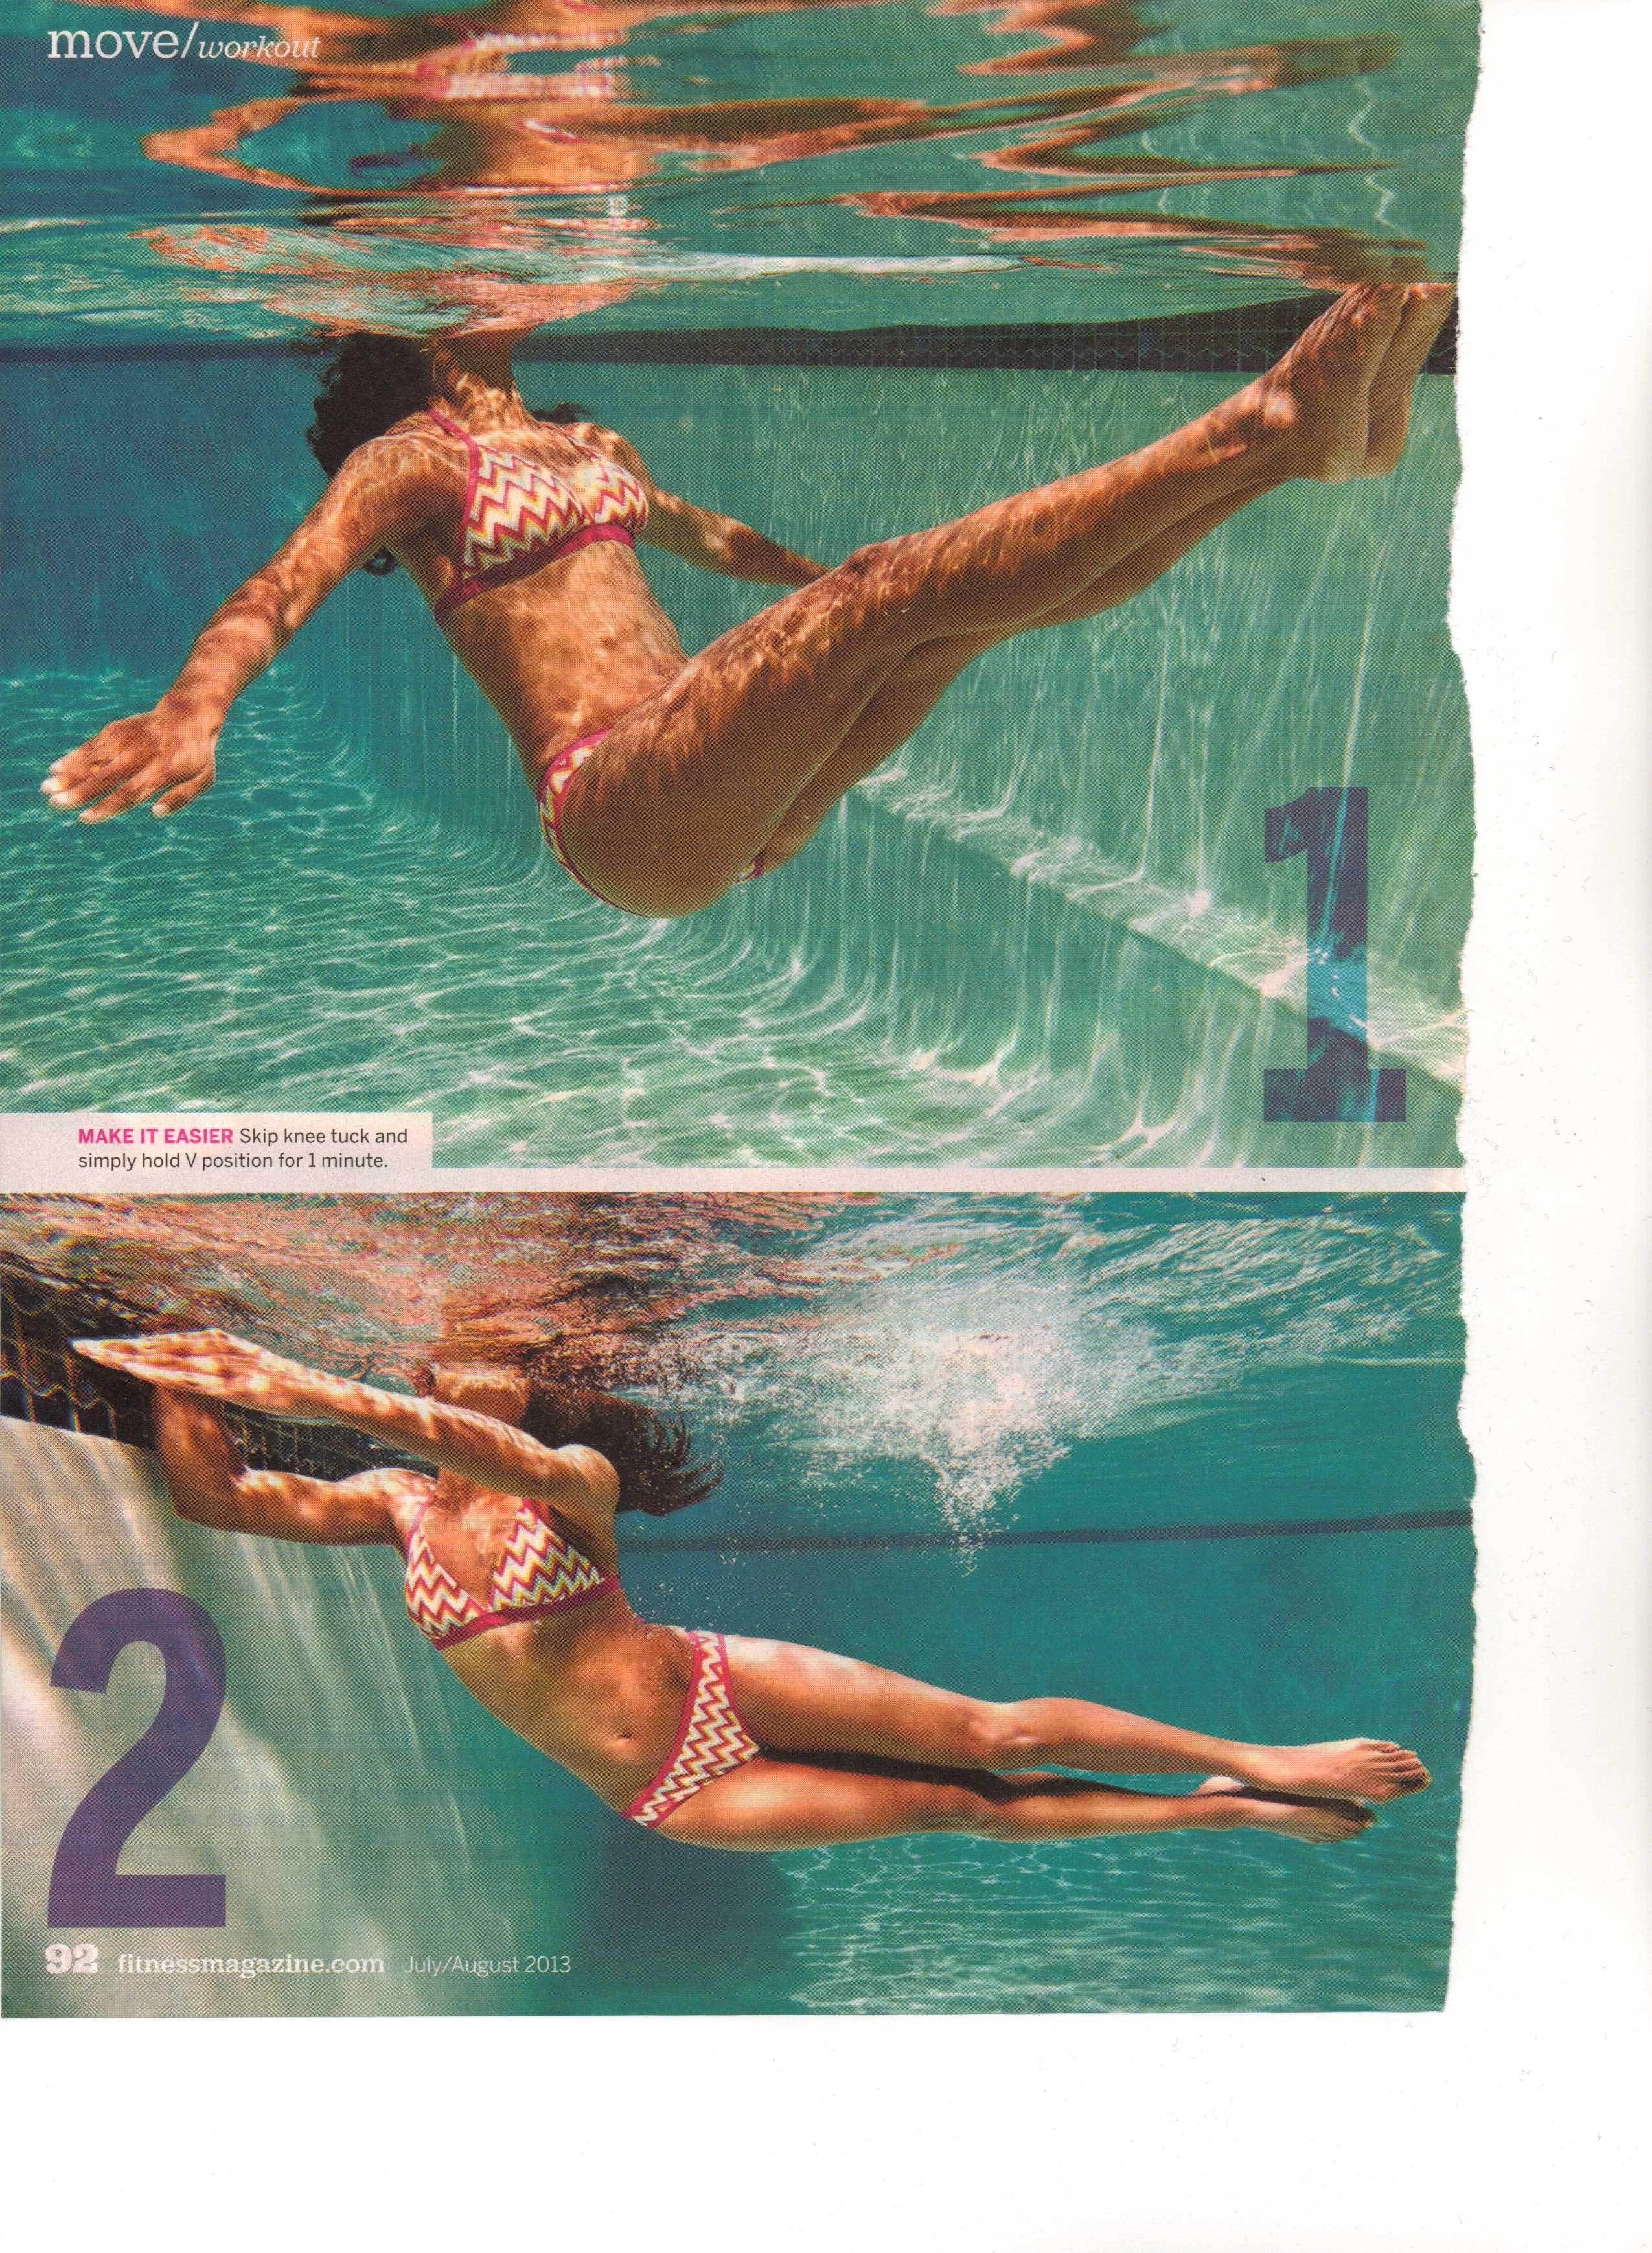 Pool Exercise 1 Magazine Articles Pinterest Pool Exercises Exercises And Pool Workout